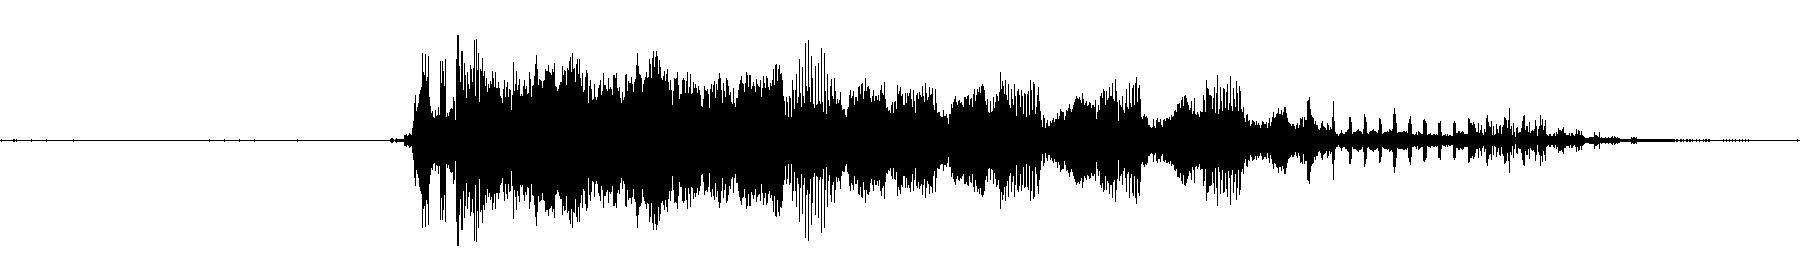 atmos 3